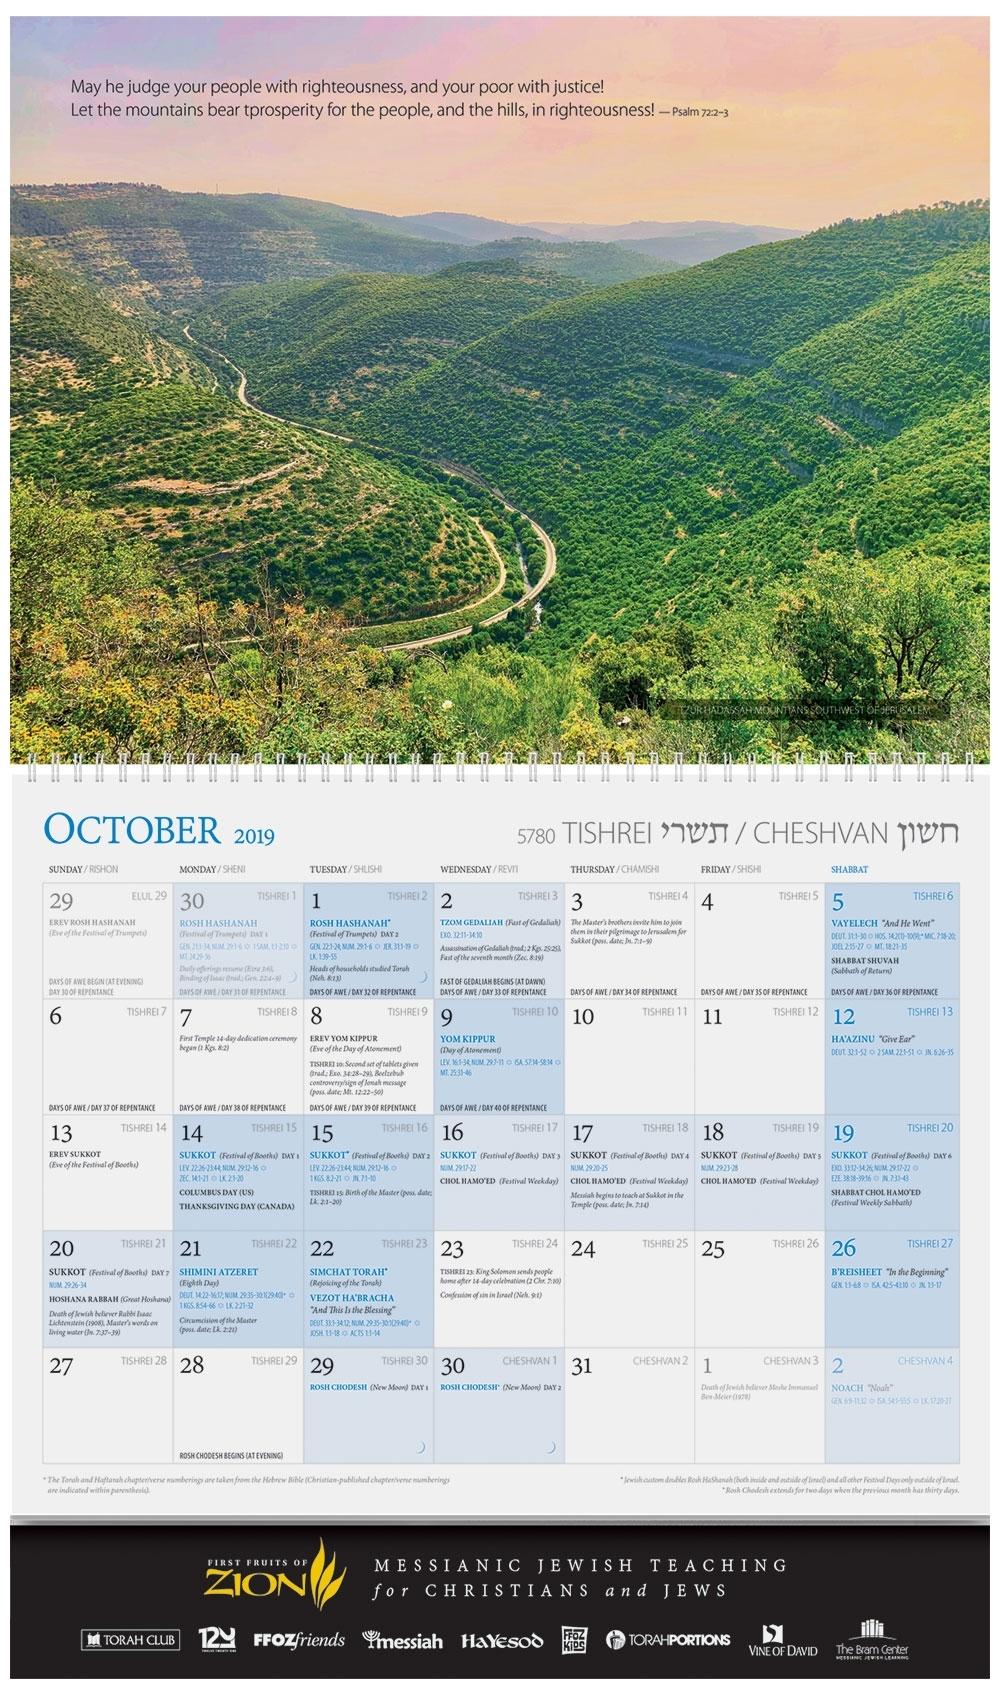 Eretz Yisrael / Land Of Israel Calendar in Weekly Torah Parsha Calendar For 2019/2020